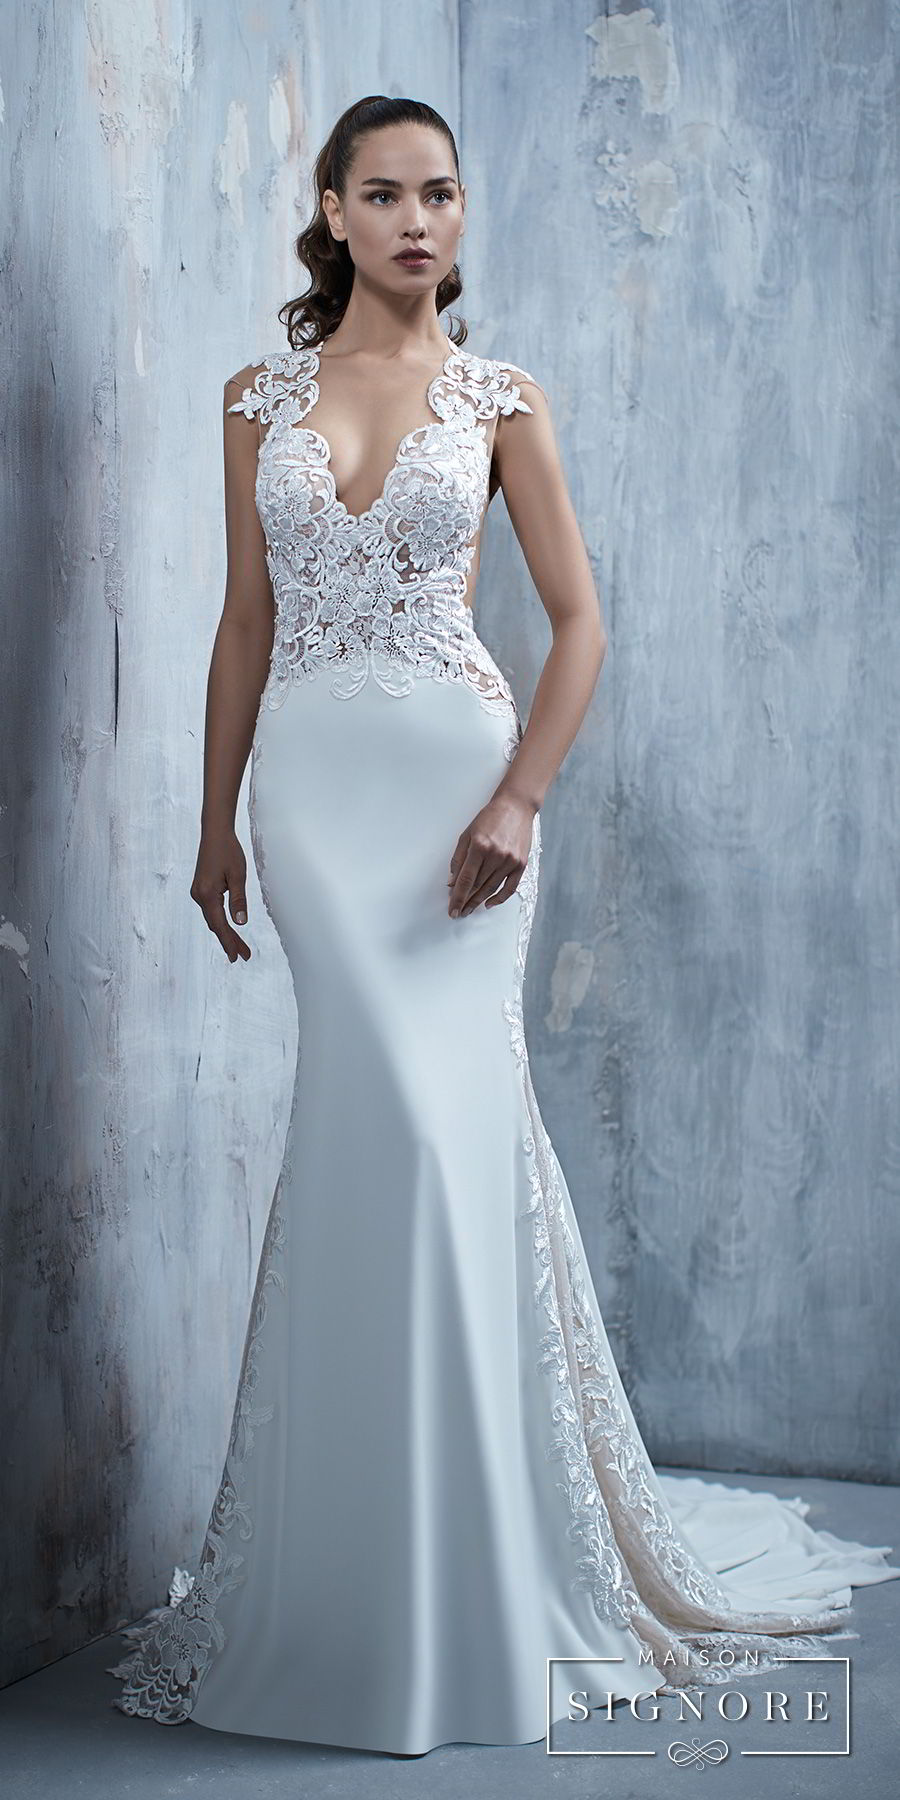 maison signore 2018 bridal cap sleeves deep v neck heavily embellished elegant fit and flare wedding dress chapel train (tessa) mv